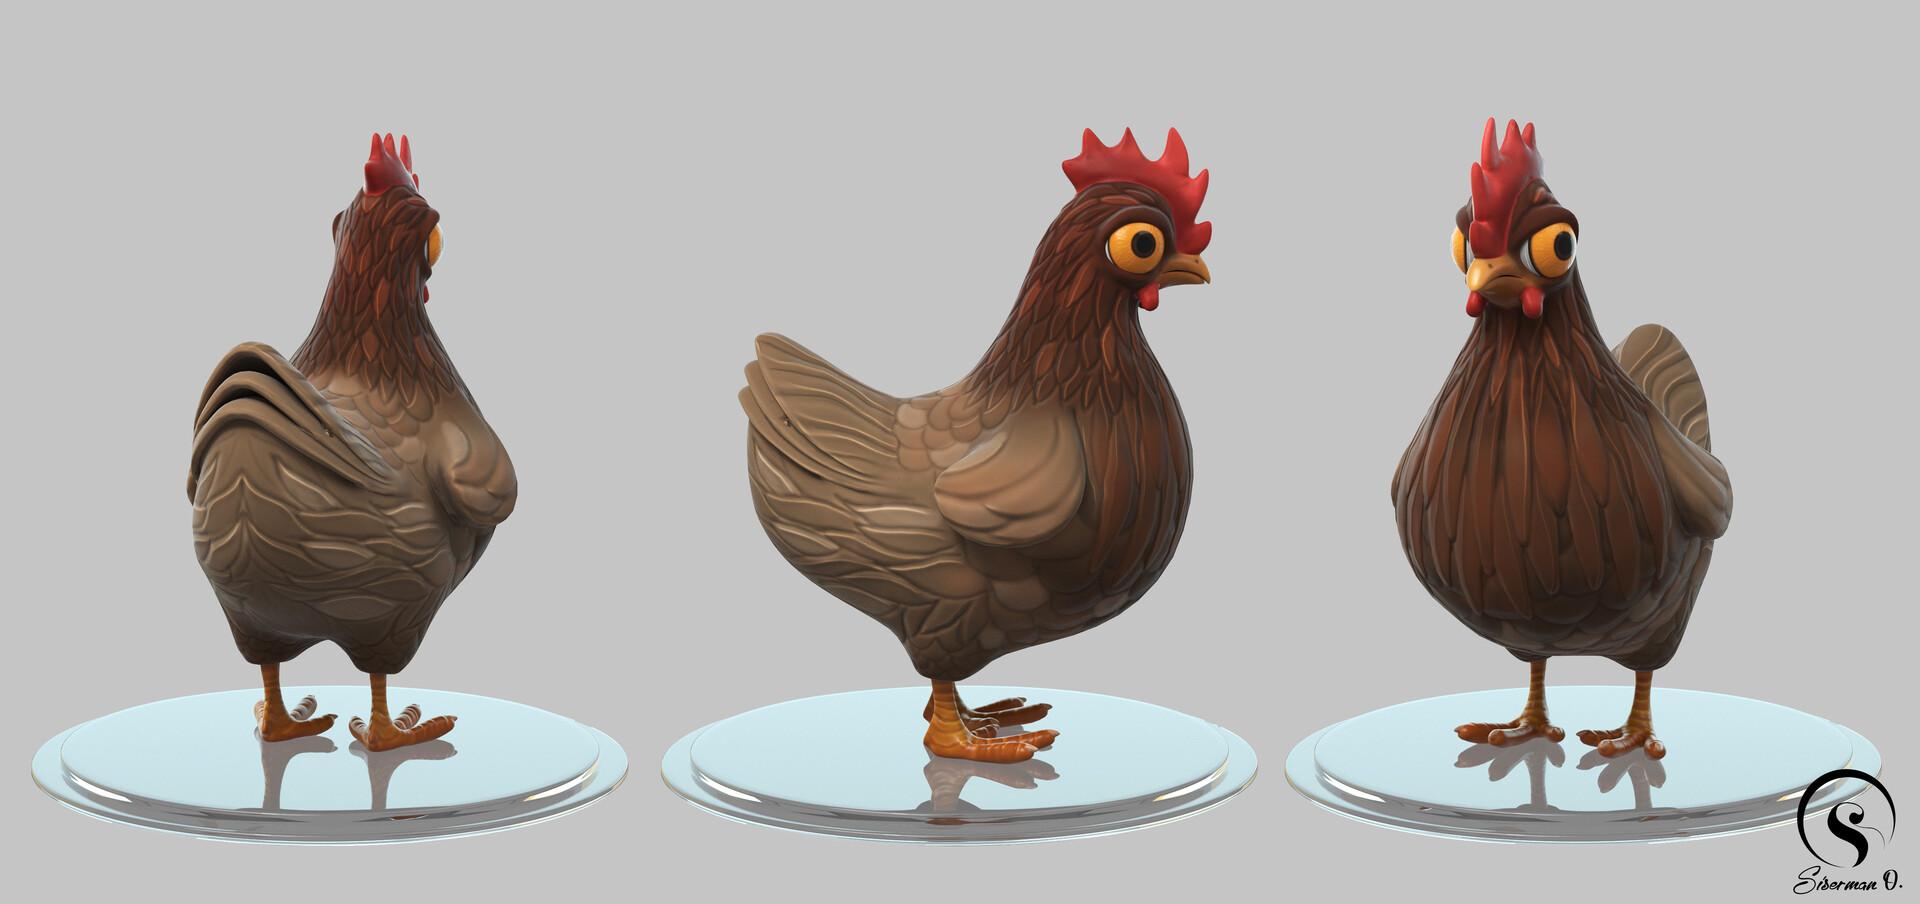 ArtStation - CSGO Chicken Character FanArt, Siserman Oana Alexandra